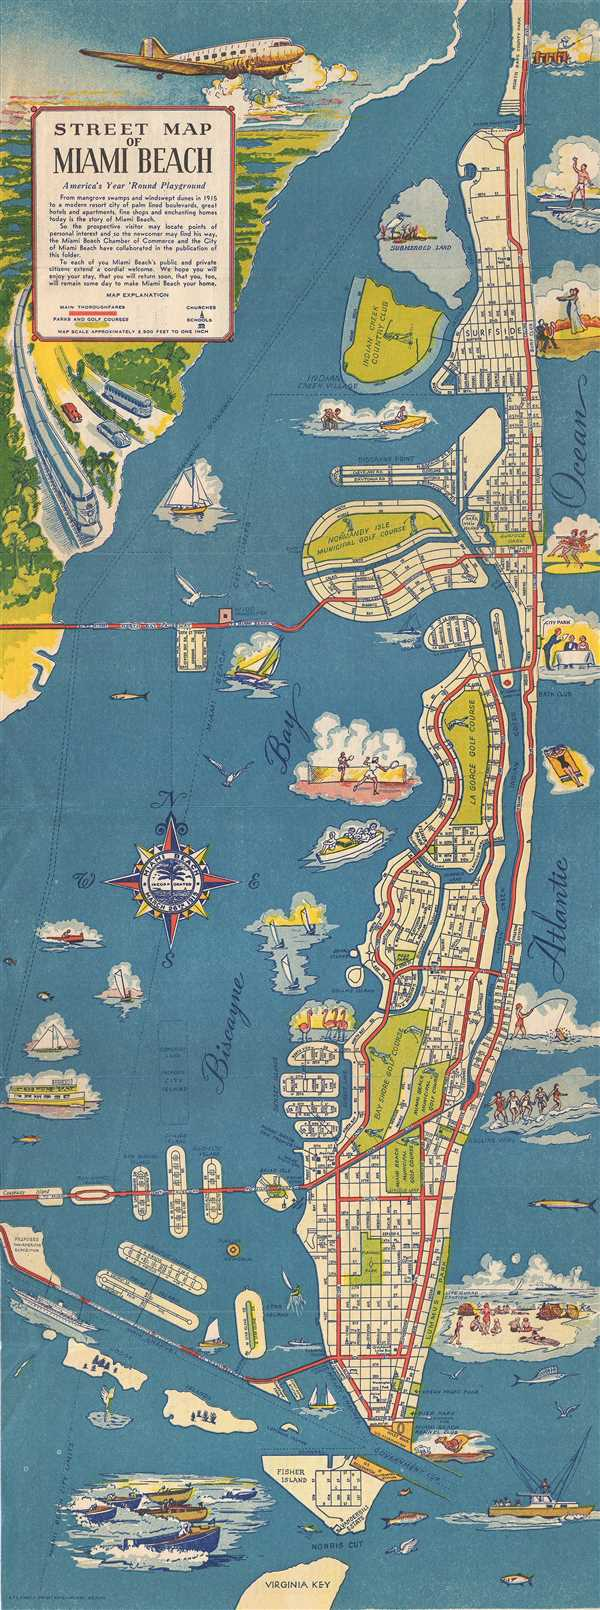 street map of miami beach.: geographicus rare antique maps